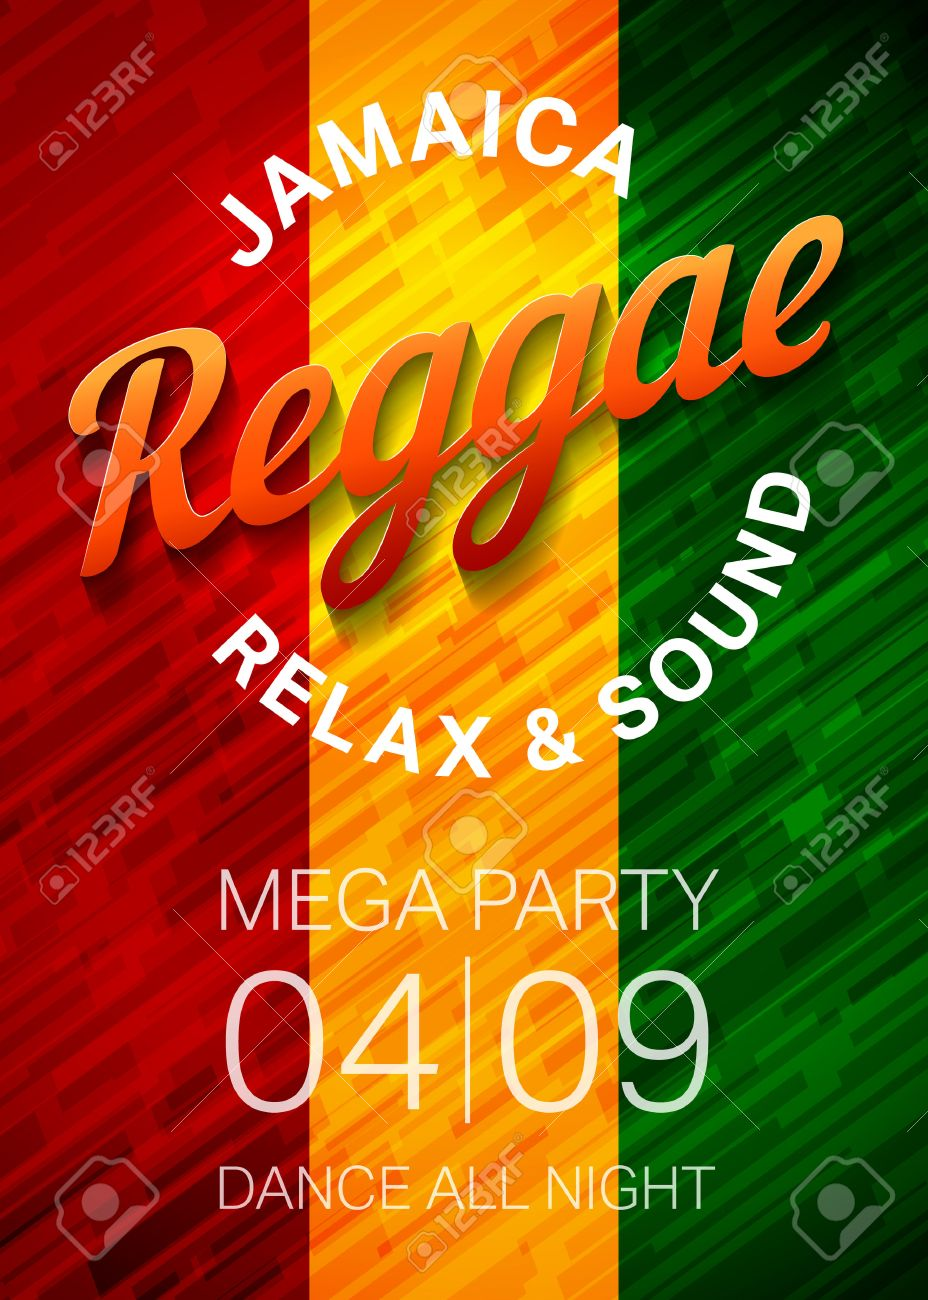 reggae music party poster template rasta dance club flyer concept vector illustration stock